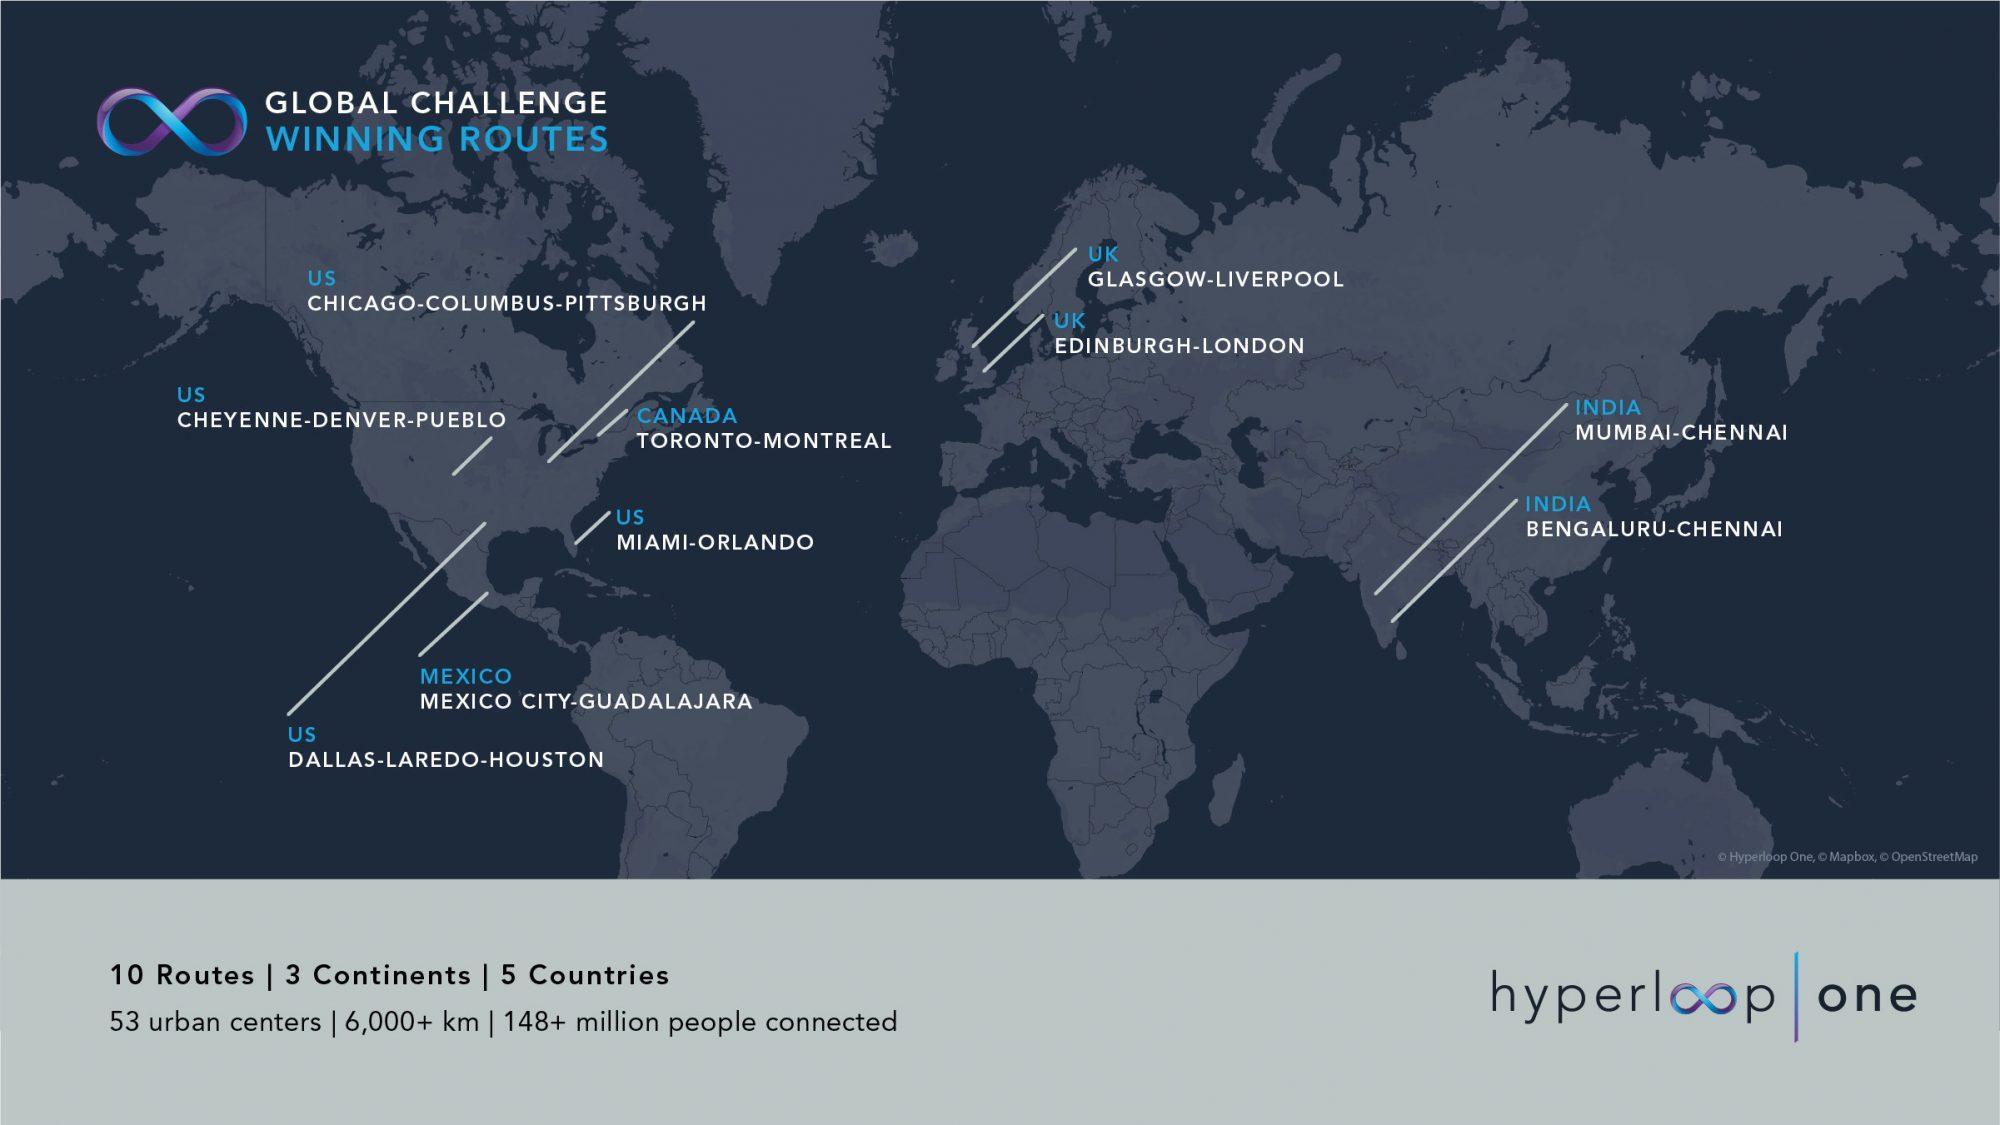 Hyperloop One picks 10 possible hyperloop routes around the world